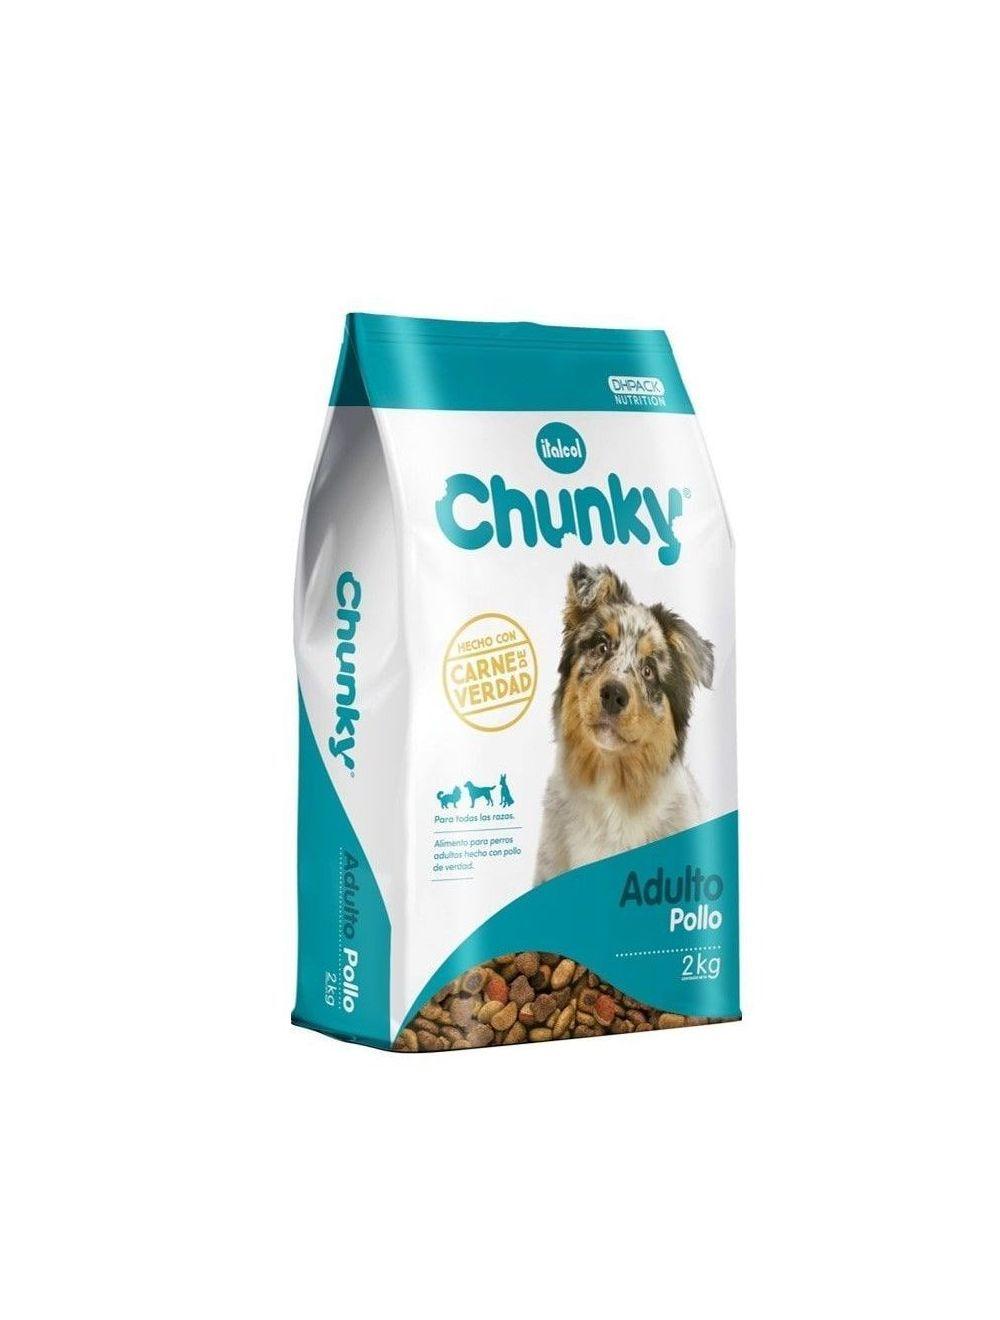 Comida Chunky Adultos Pollo 25 kilos - Ciudaddemascotas.com